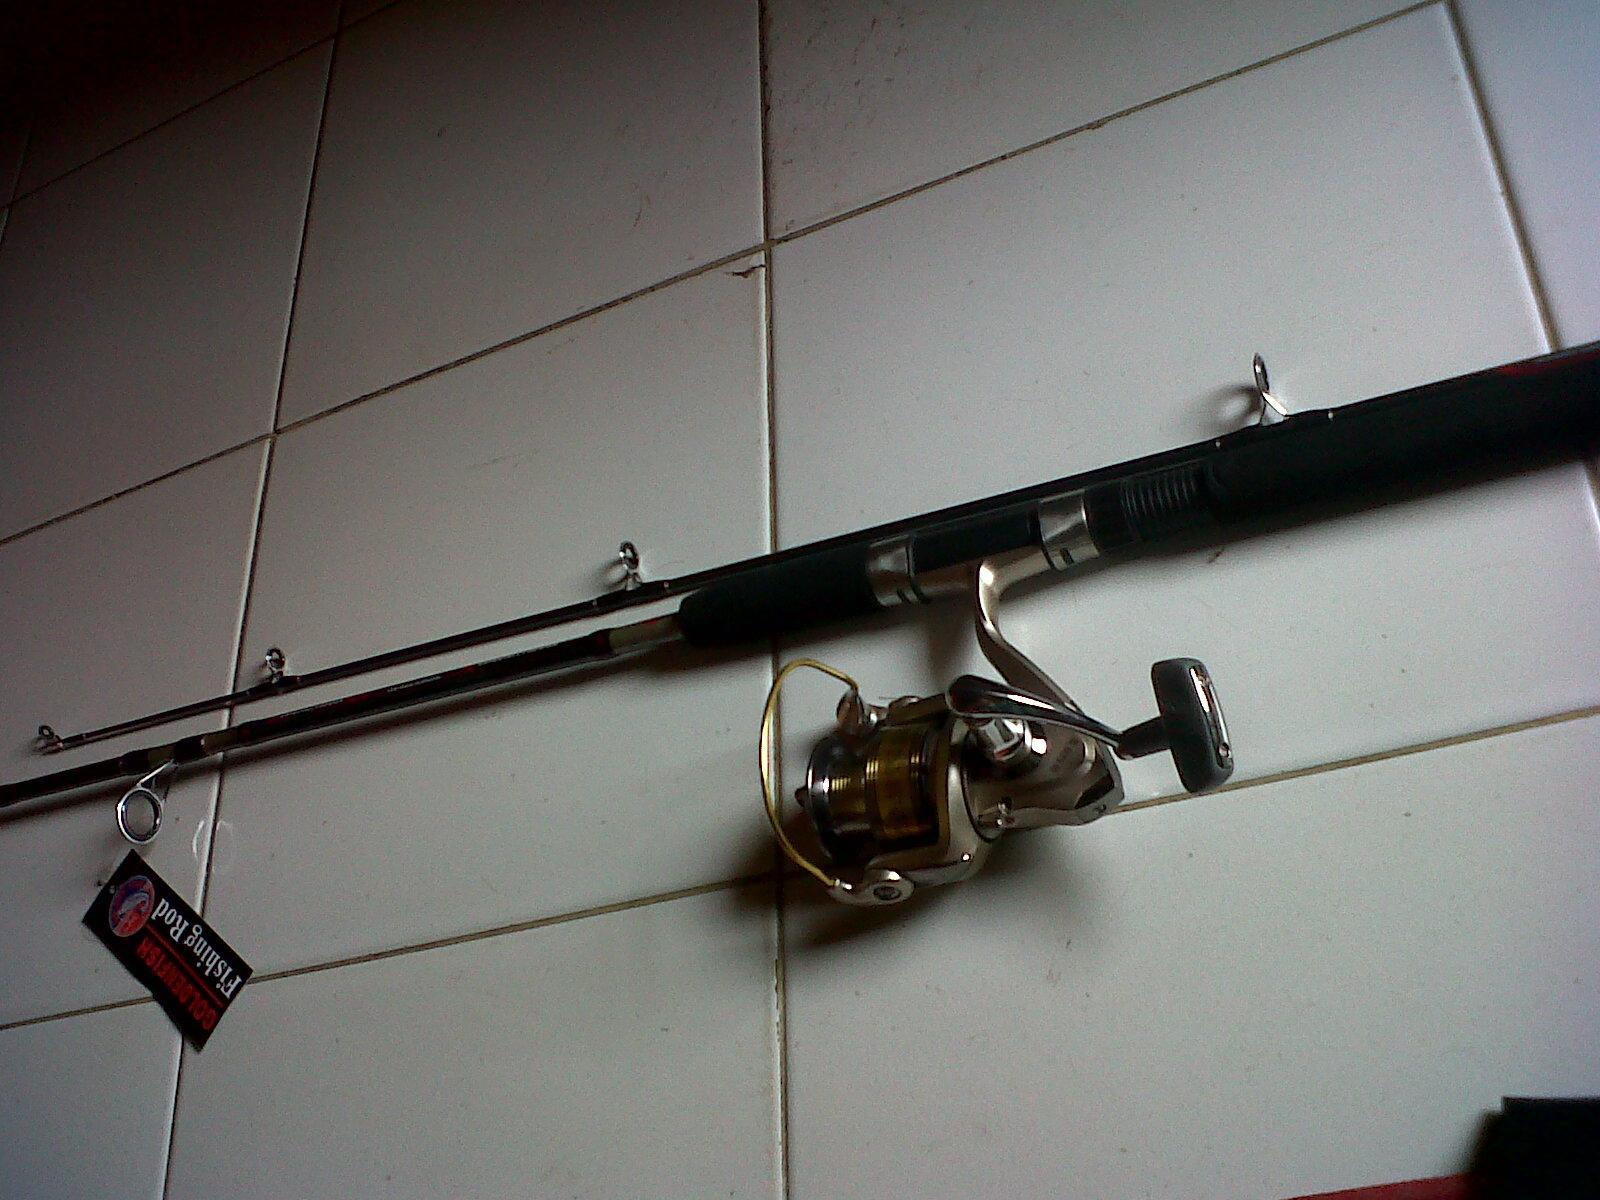 Jual Set Pancing Golden Fish Megatron 8 1 Bearings